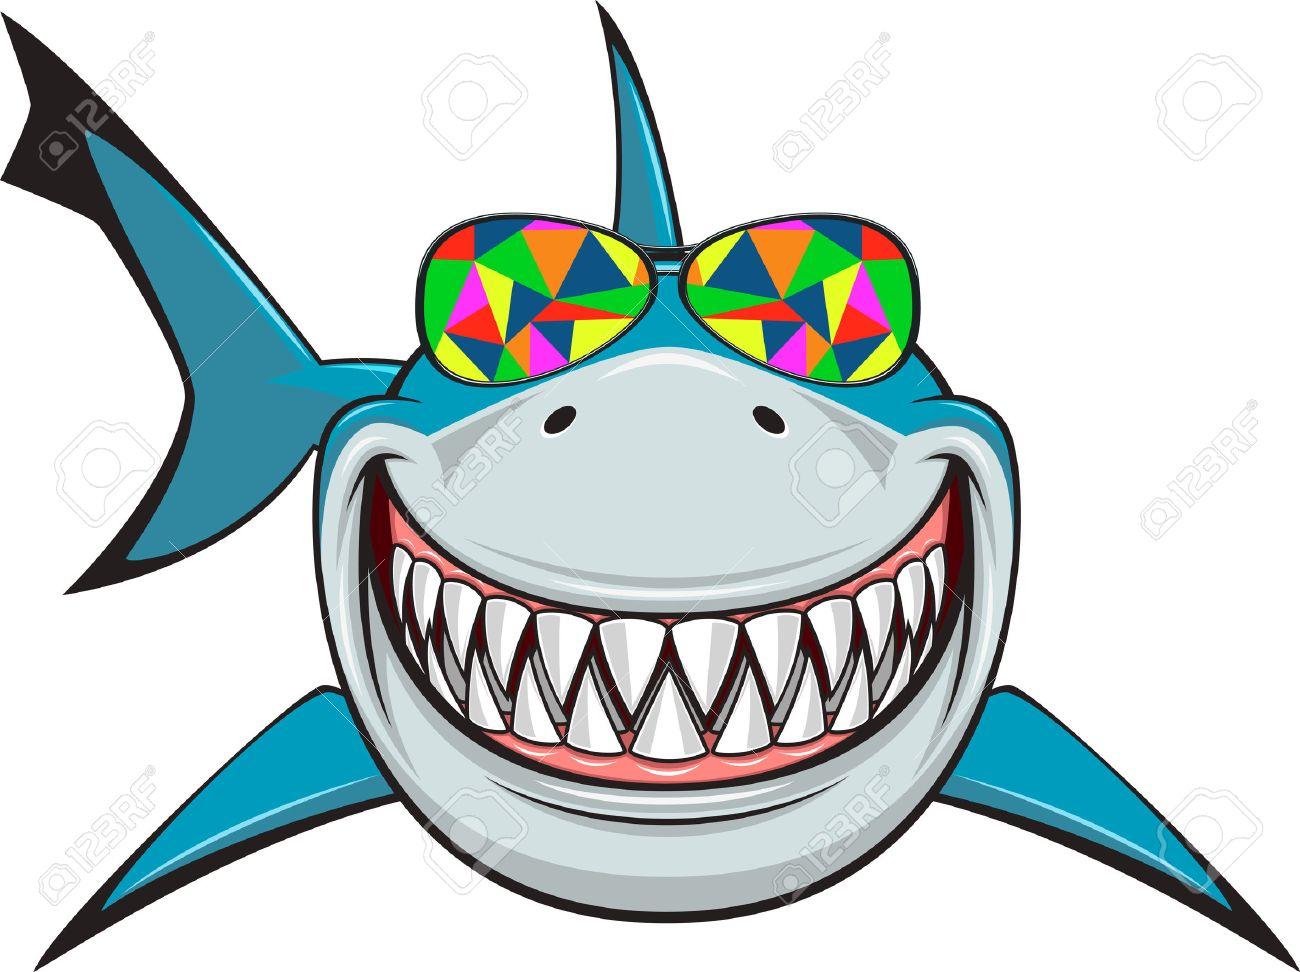 4 022 shark teeth stock illustrations cliparts and royalty free rh 123rf com shark clipart for kids shark clipart png